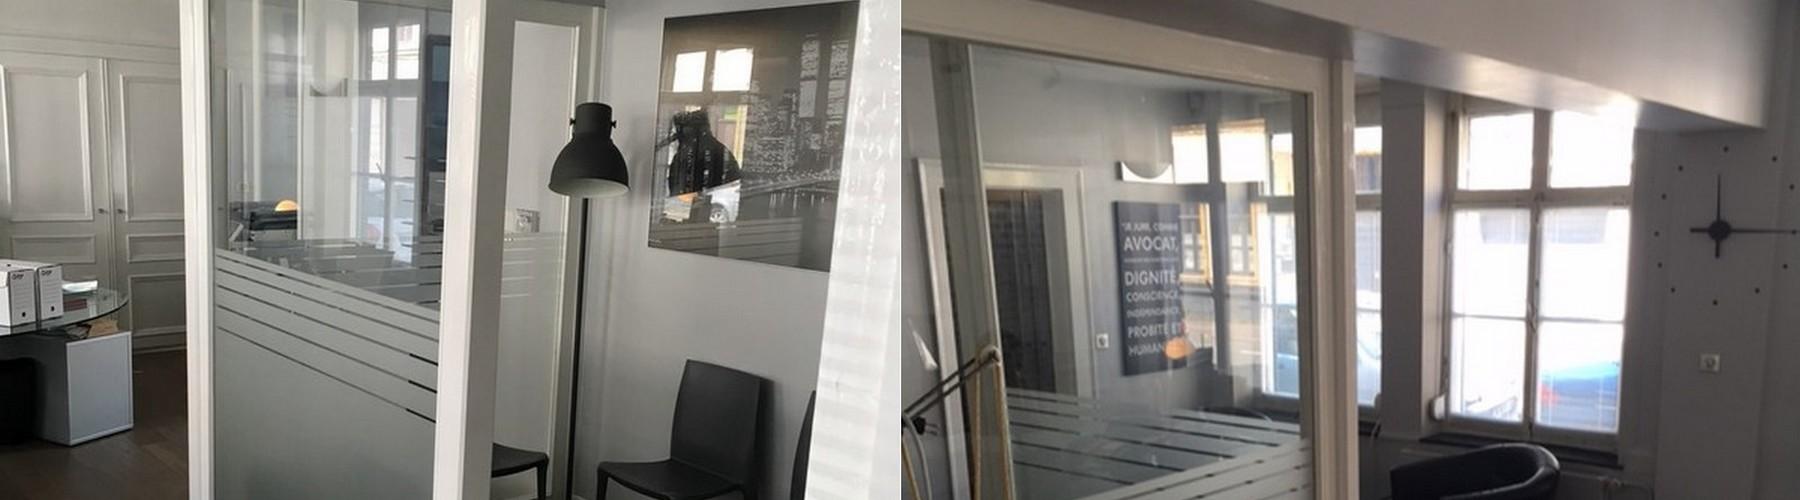 moyart cabinet d 39 avocats au barreau de lille. Black Bedroom Furniture Sets. Home Design Ideas